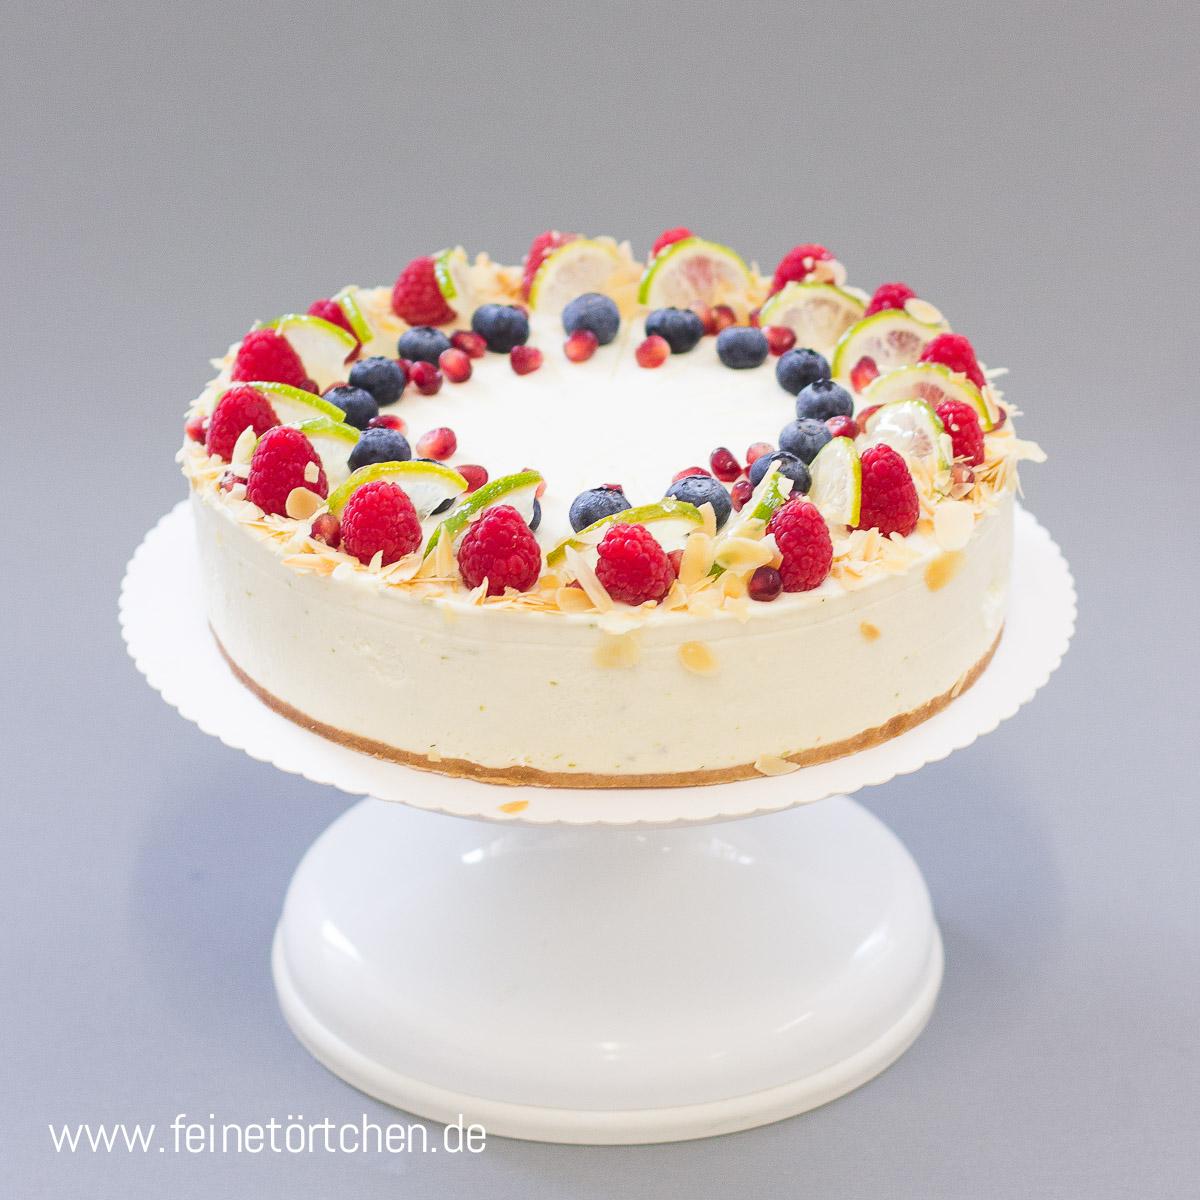 Holunder Limette Quark Mademoiselle Cupcake Webshop